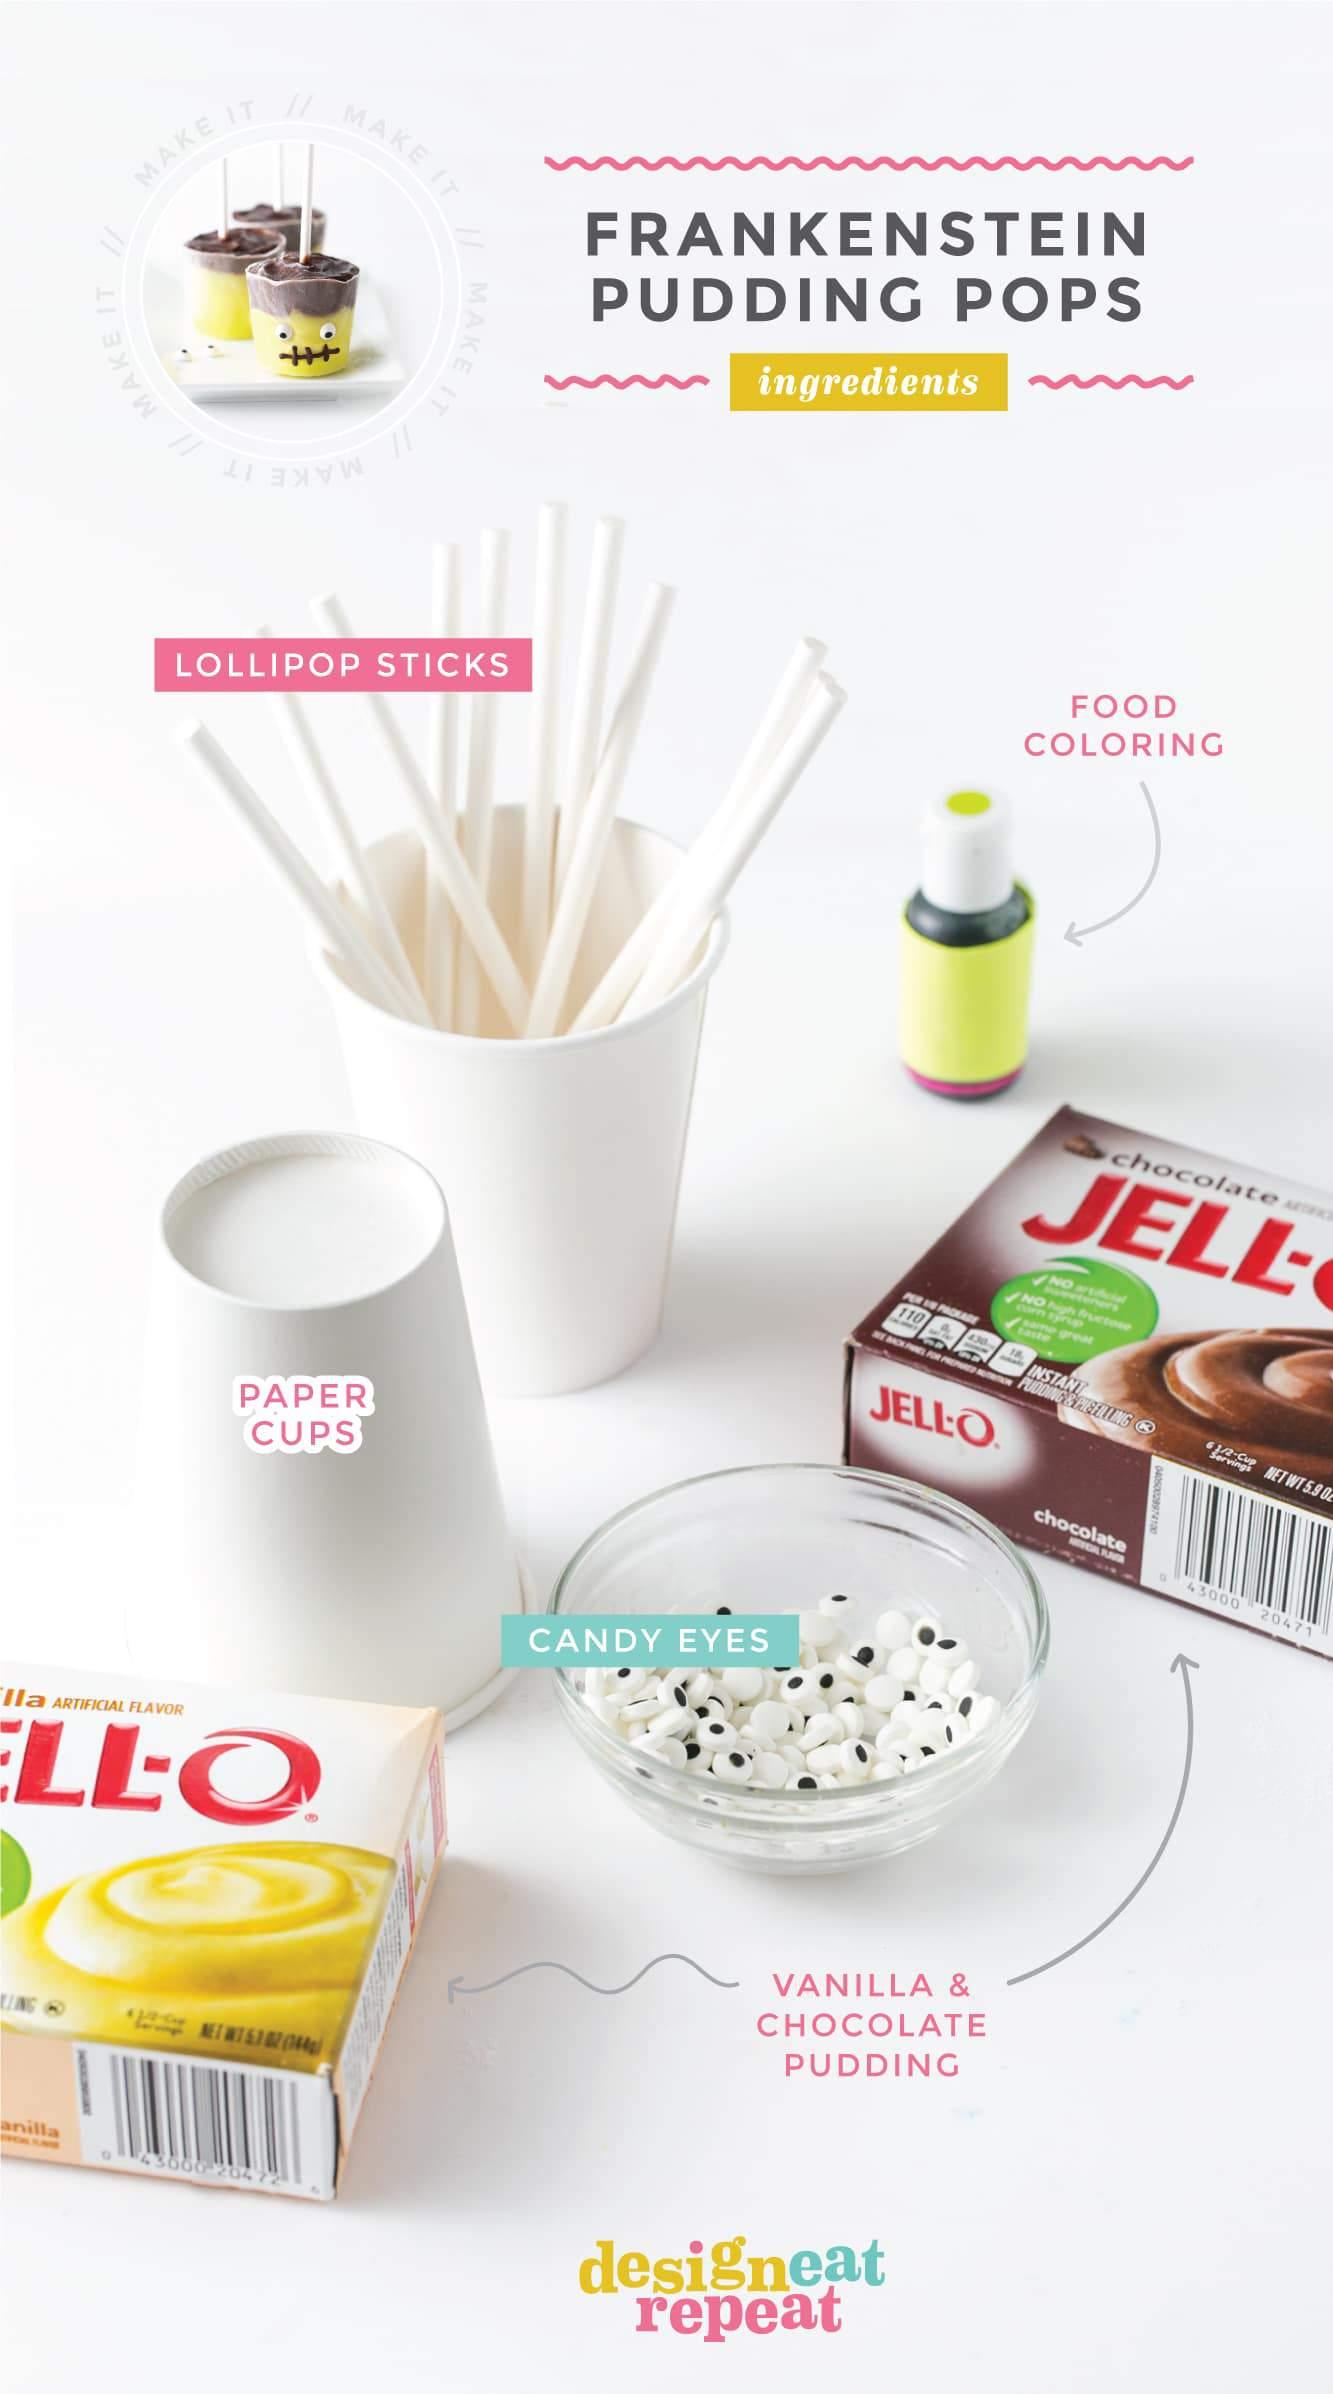 Ingredients for Frozen Halloween Pudding Pops